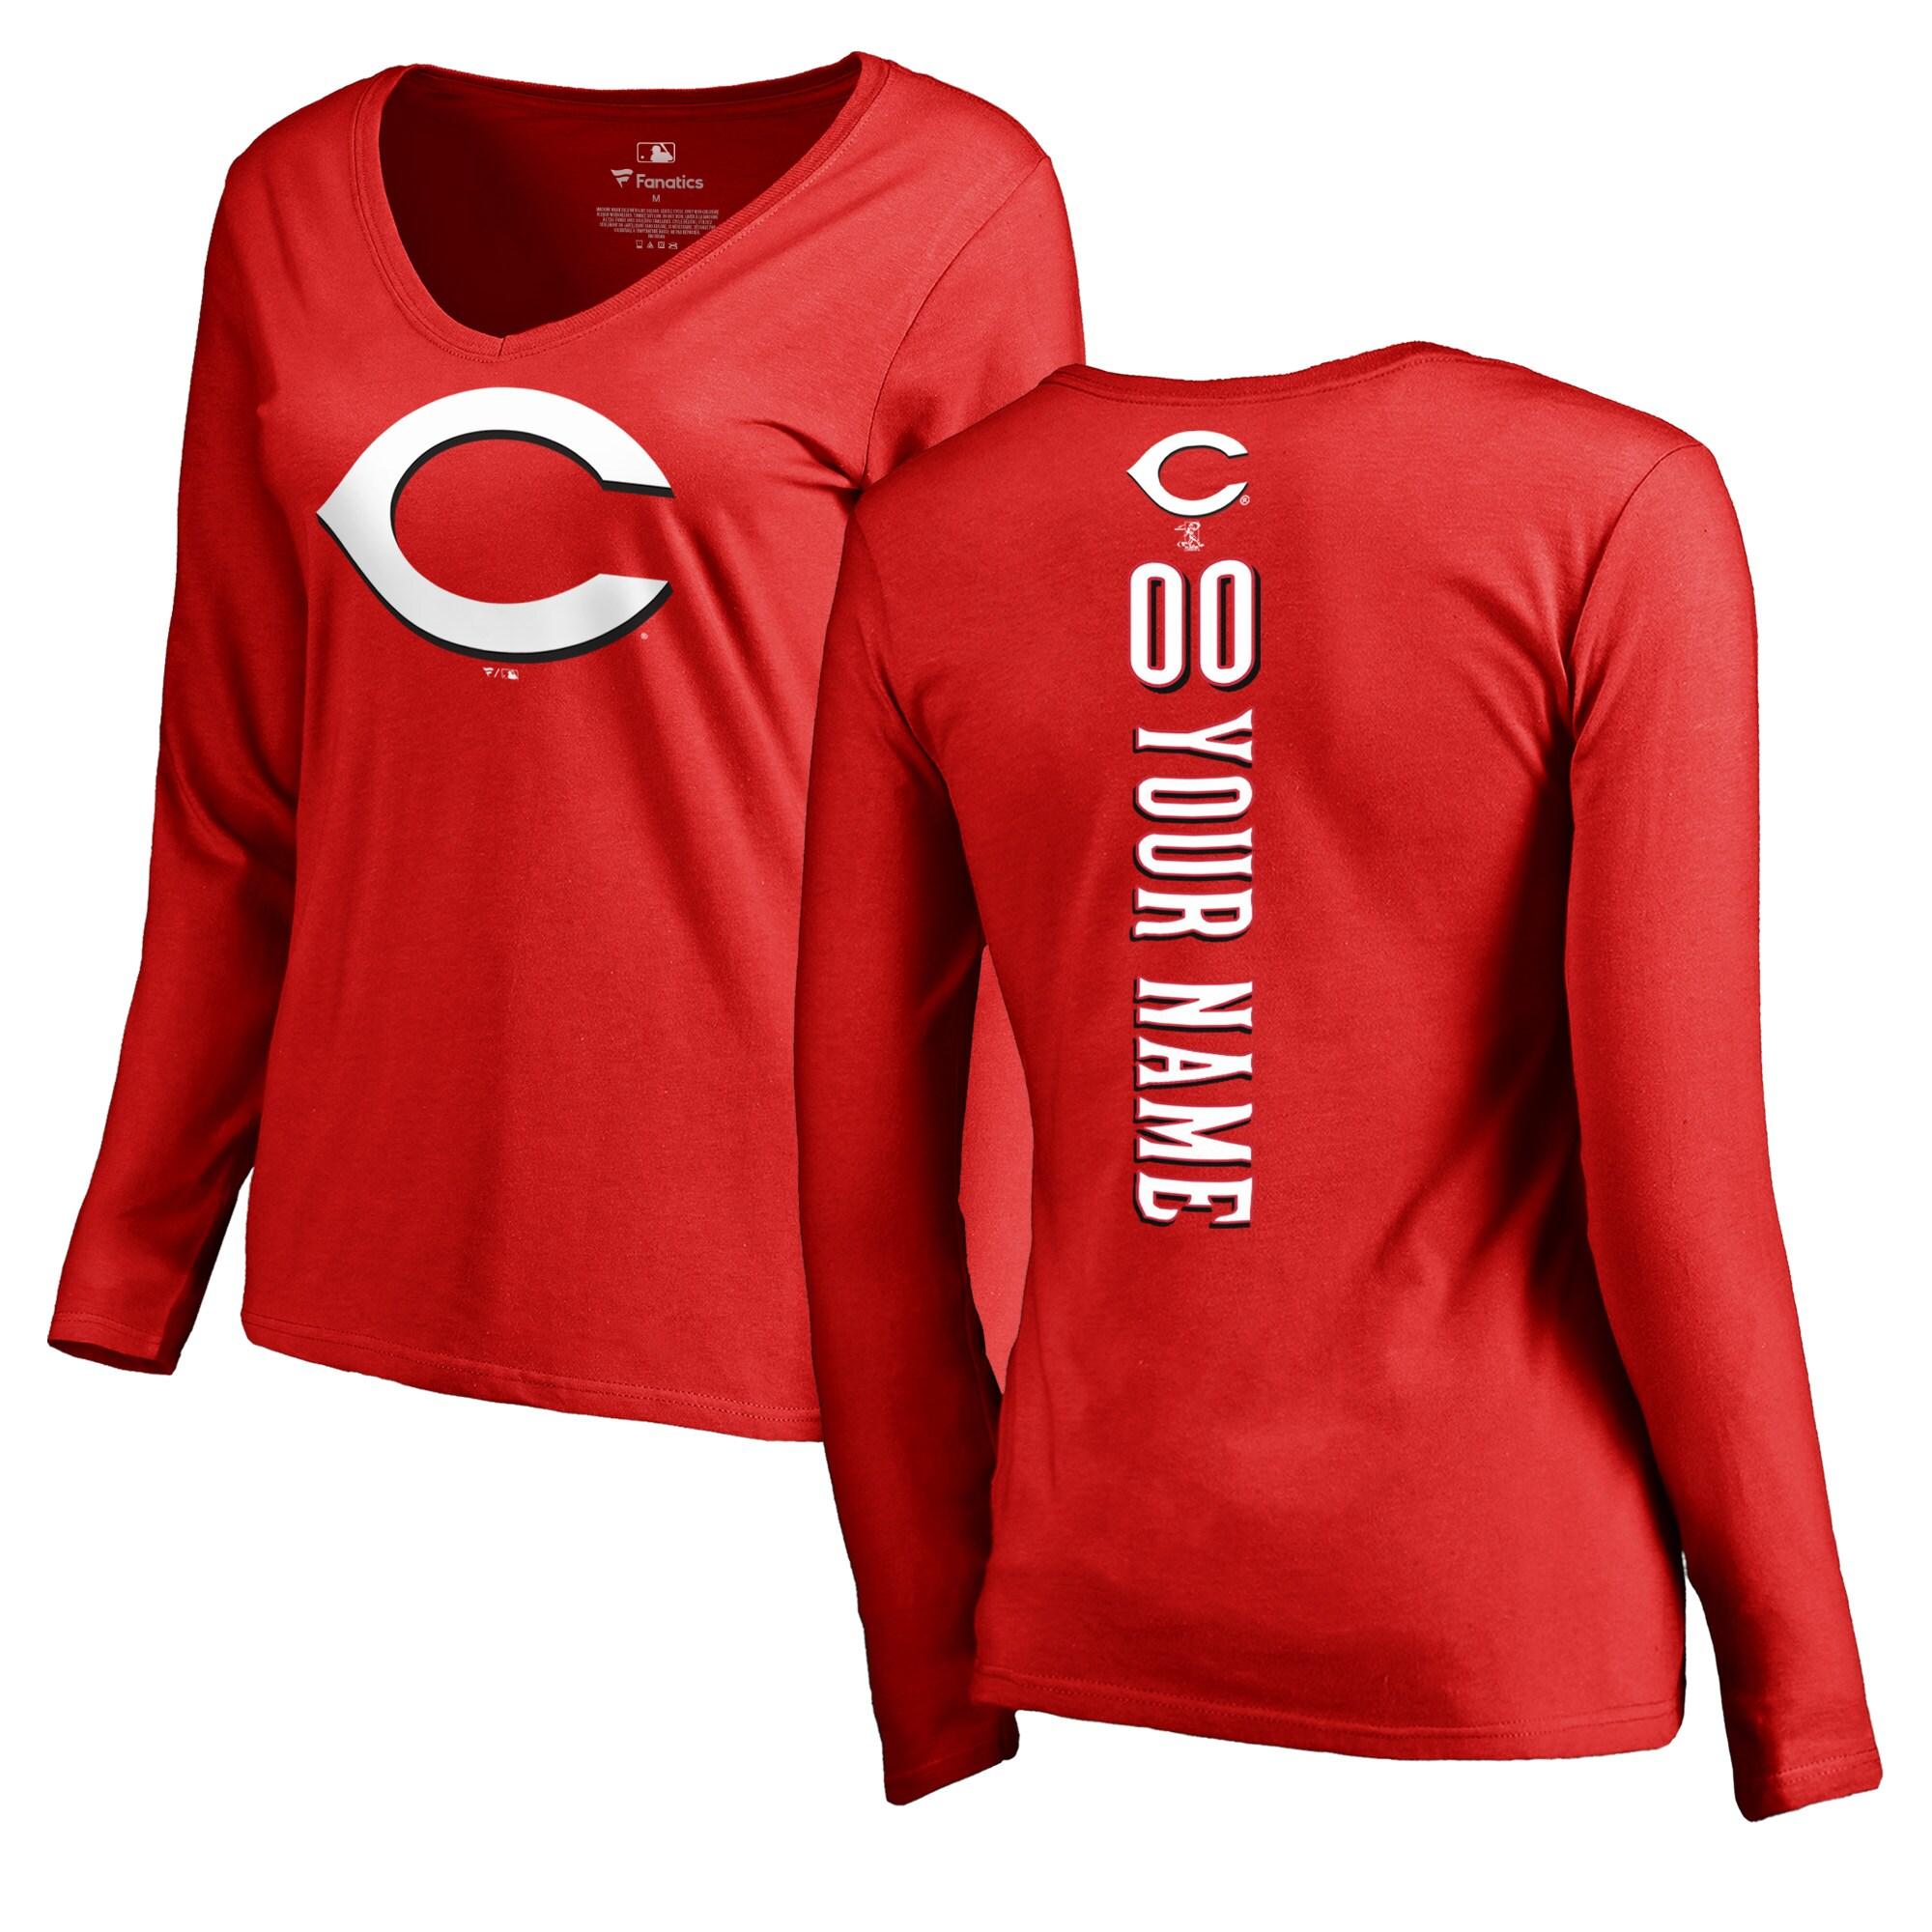 Cincinnati Reds Fanatics Branded Women's Personalized Playmaker Long Sleeve T-Shirt - Red